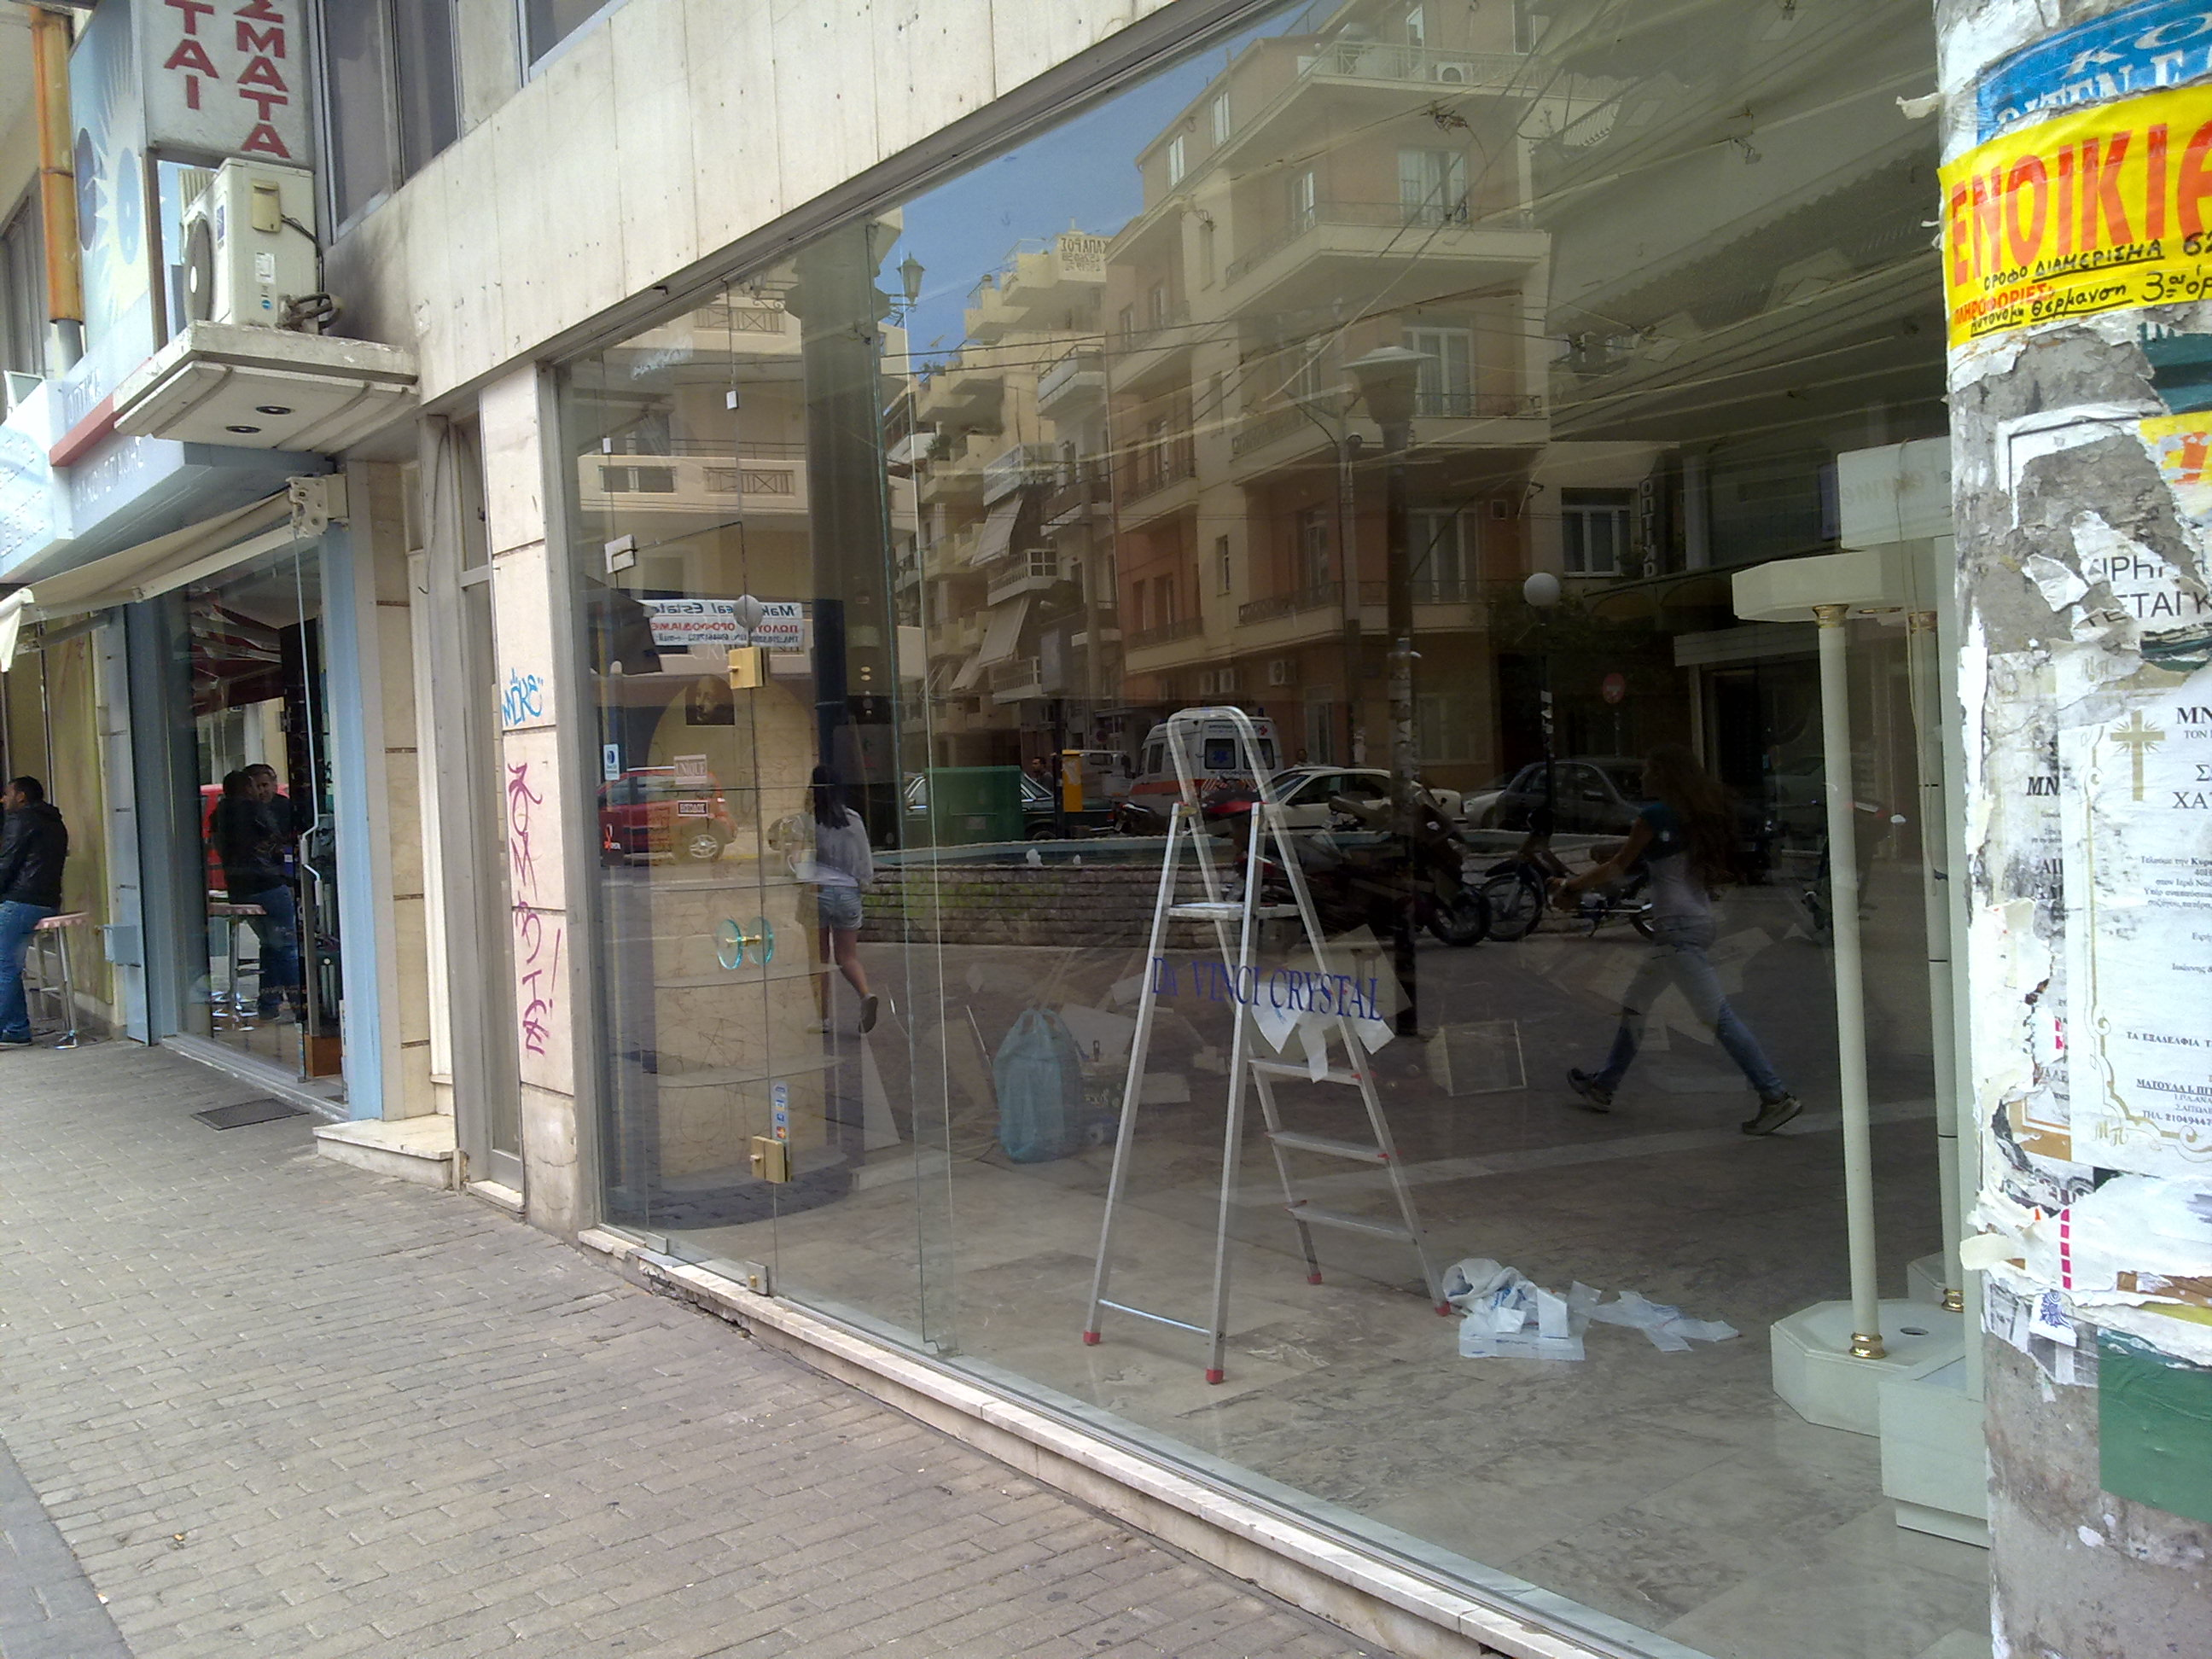 77a10b6e5012 Στο ρεπορτάζ του NewsΙt καταγράψαμε εικόνες δεκάδων άδειων επαγγελματικών  χώρων σε όλη την περιοχή του Πειραιά. Συνομιλήσαμε με μαγαζάτορες που μας  εξηγούν ...